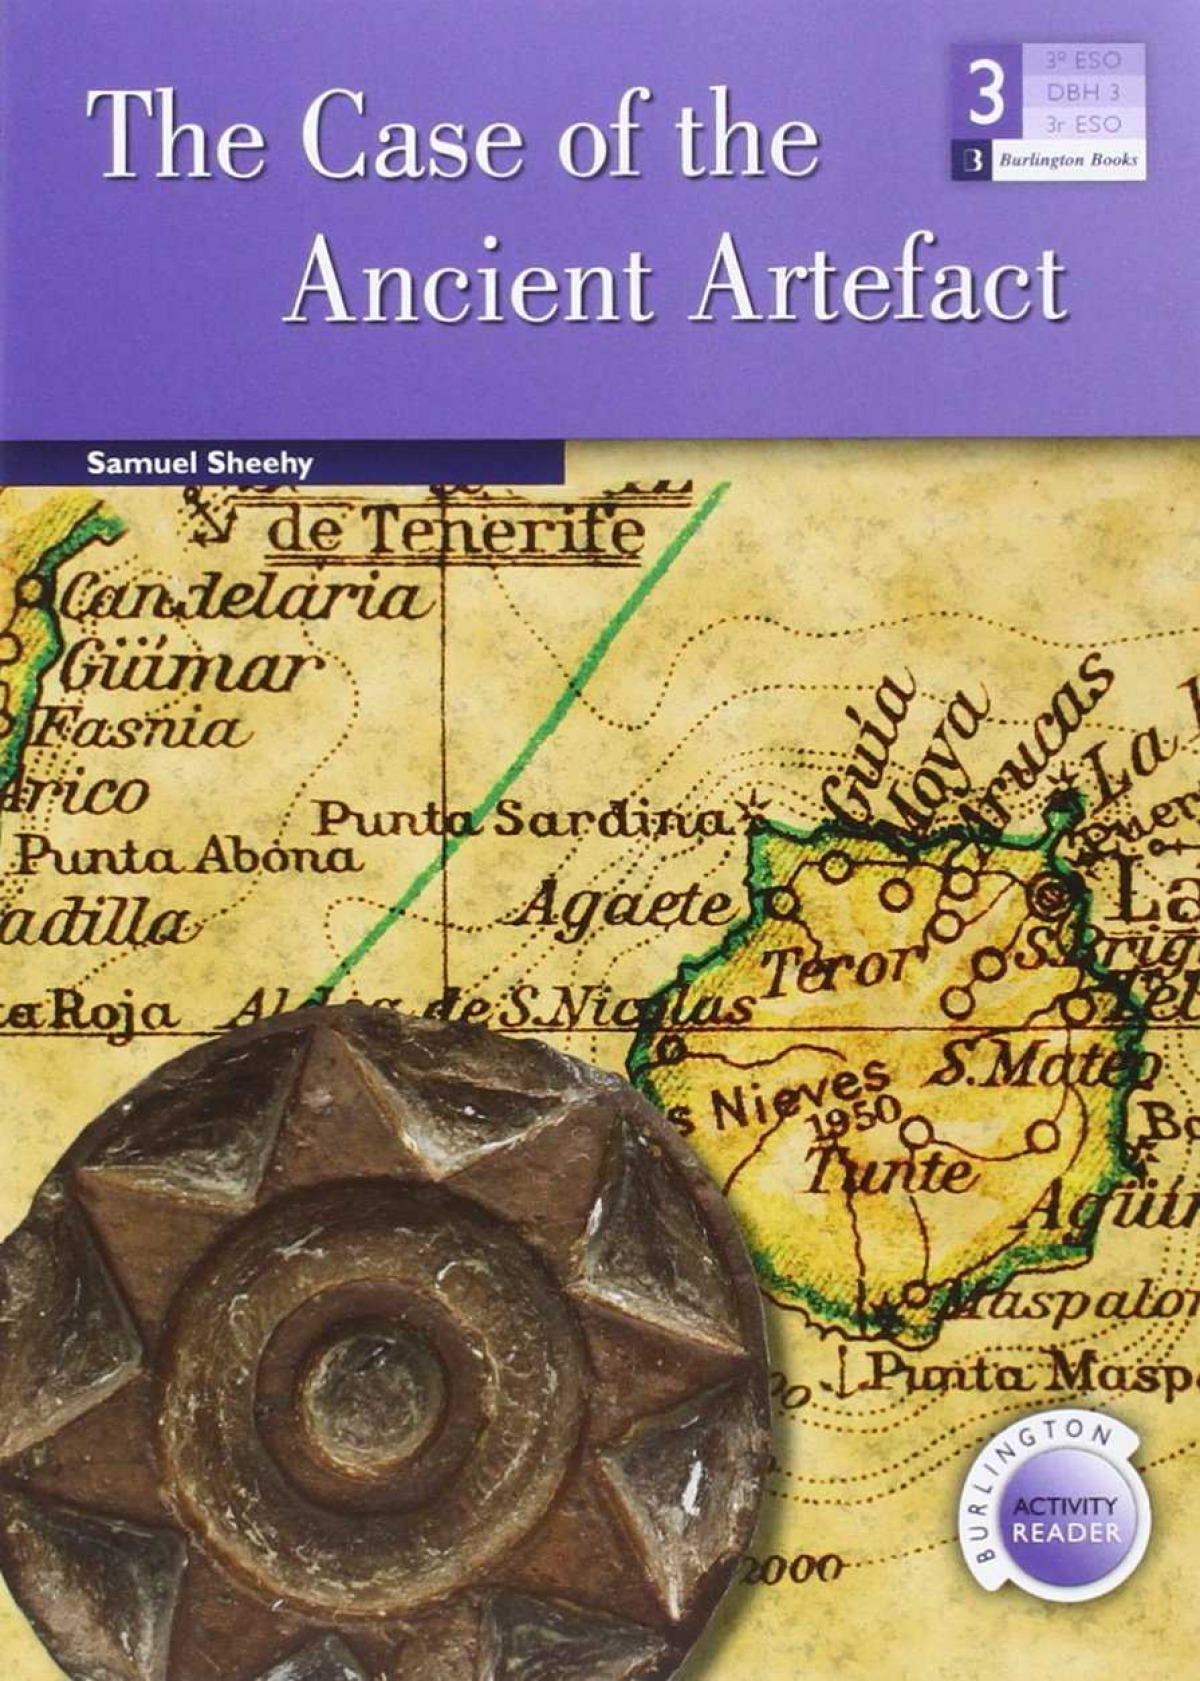 Case of the ancient artefact 3o.eso. Reader 9789963512614